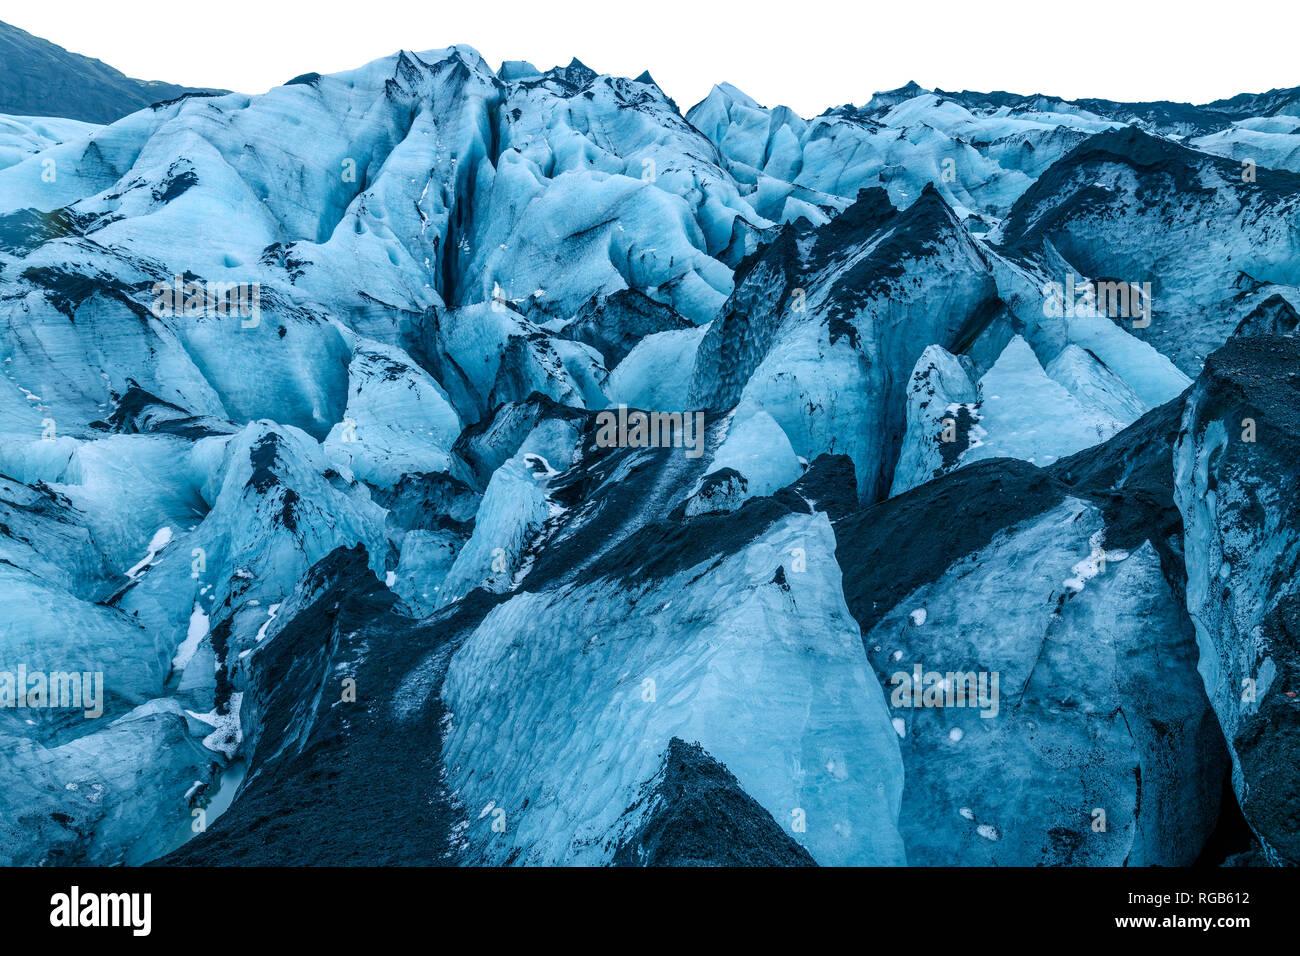 Myrdalsjokull Glacier at Mýrdalshreppur near Vik, Iceland, in Winter - Stock Image